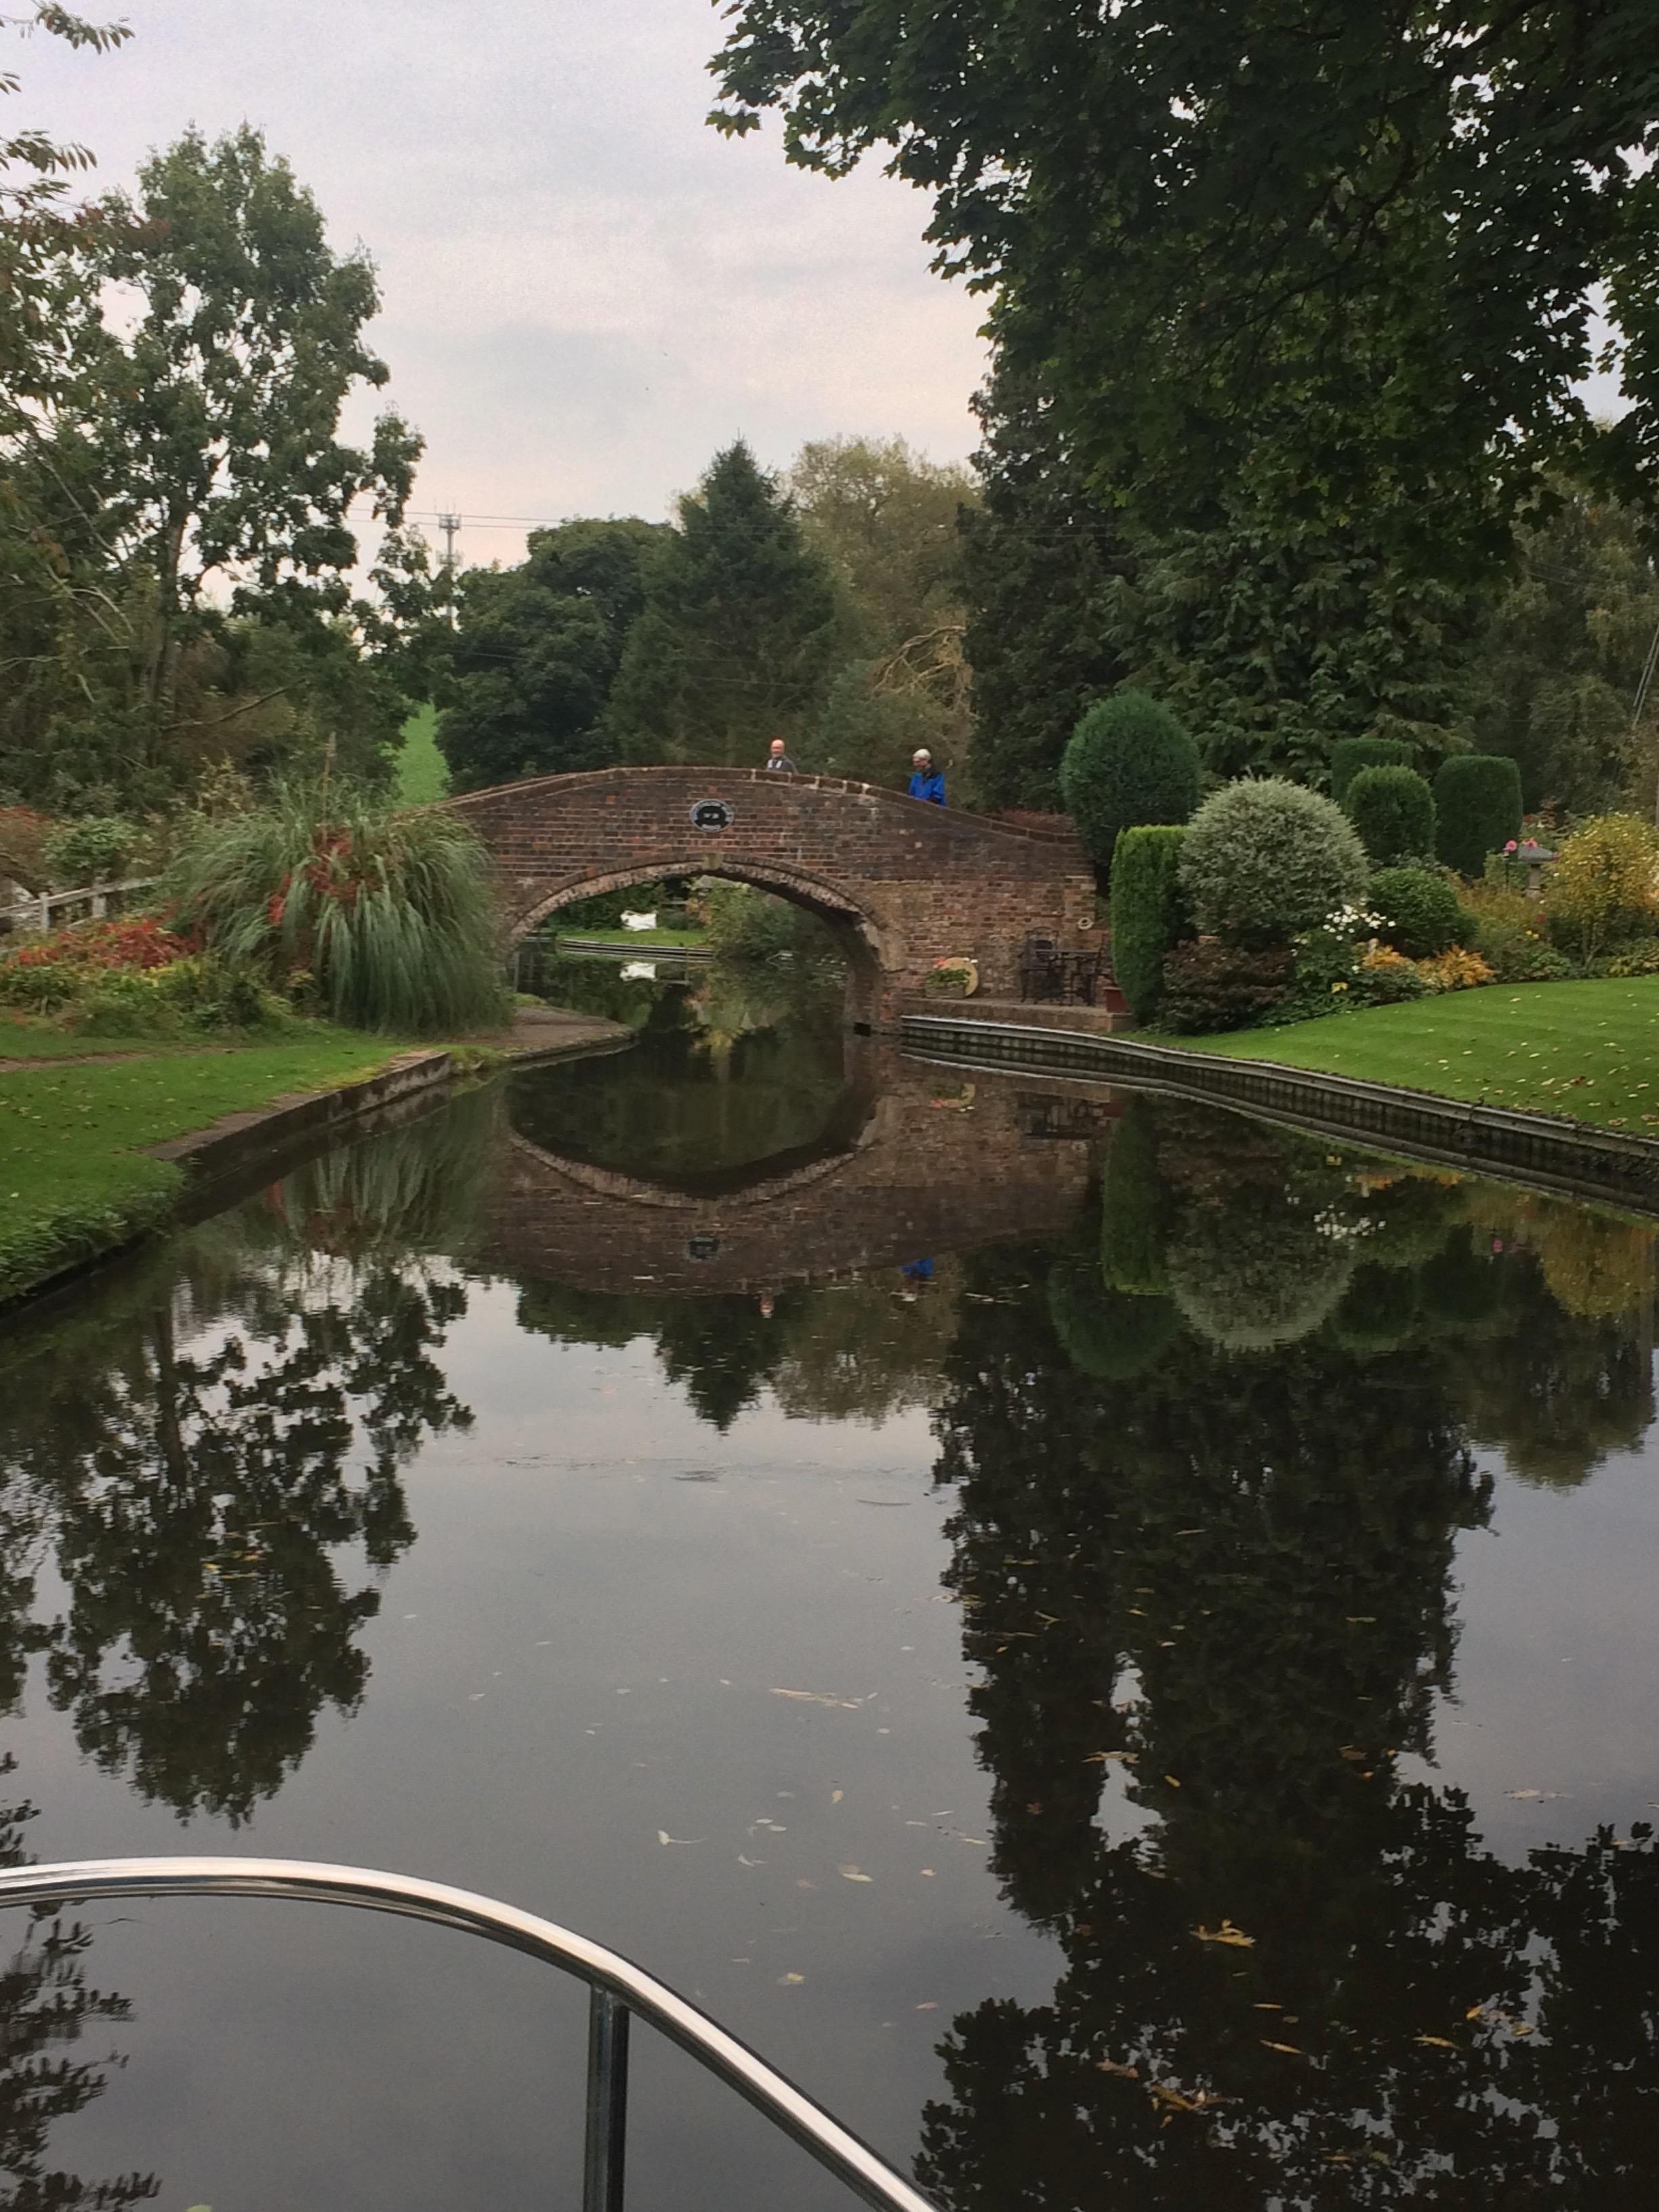 Quintessential bridge over a canal